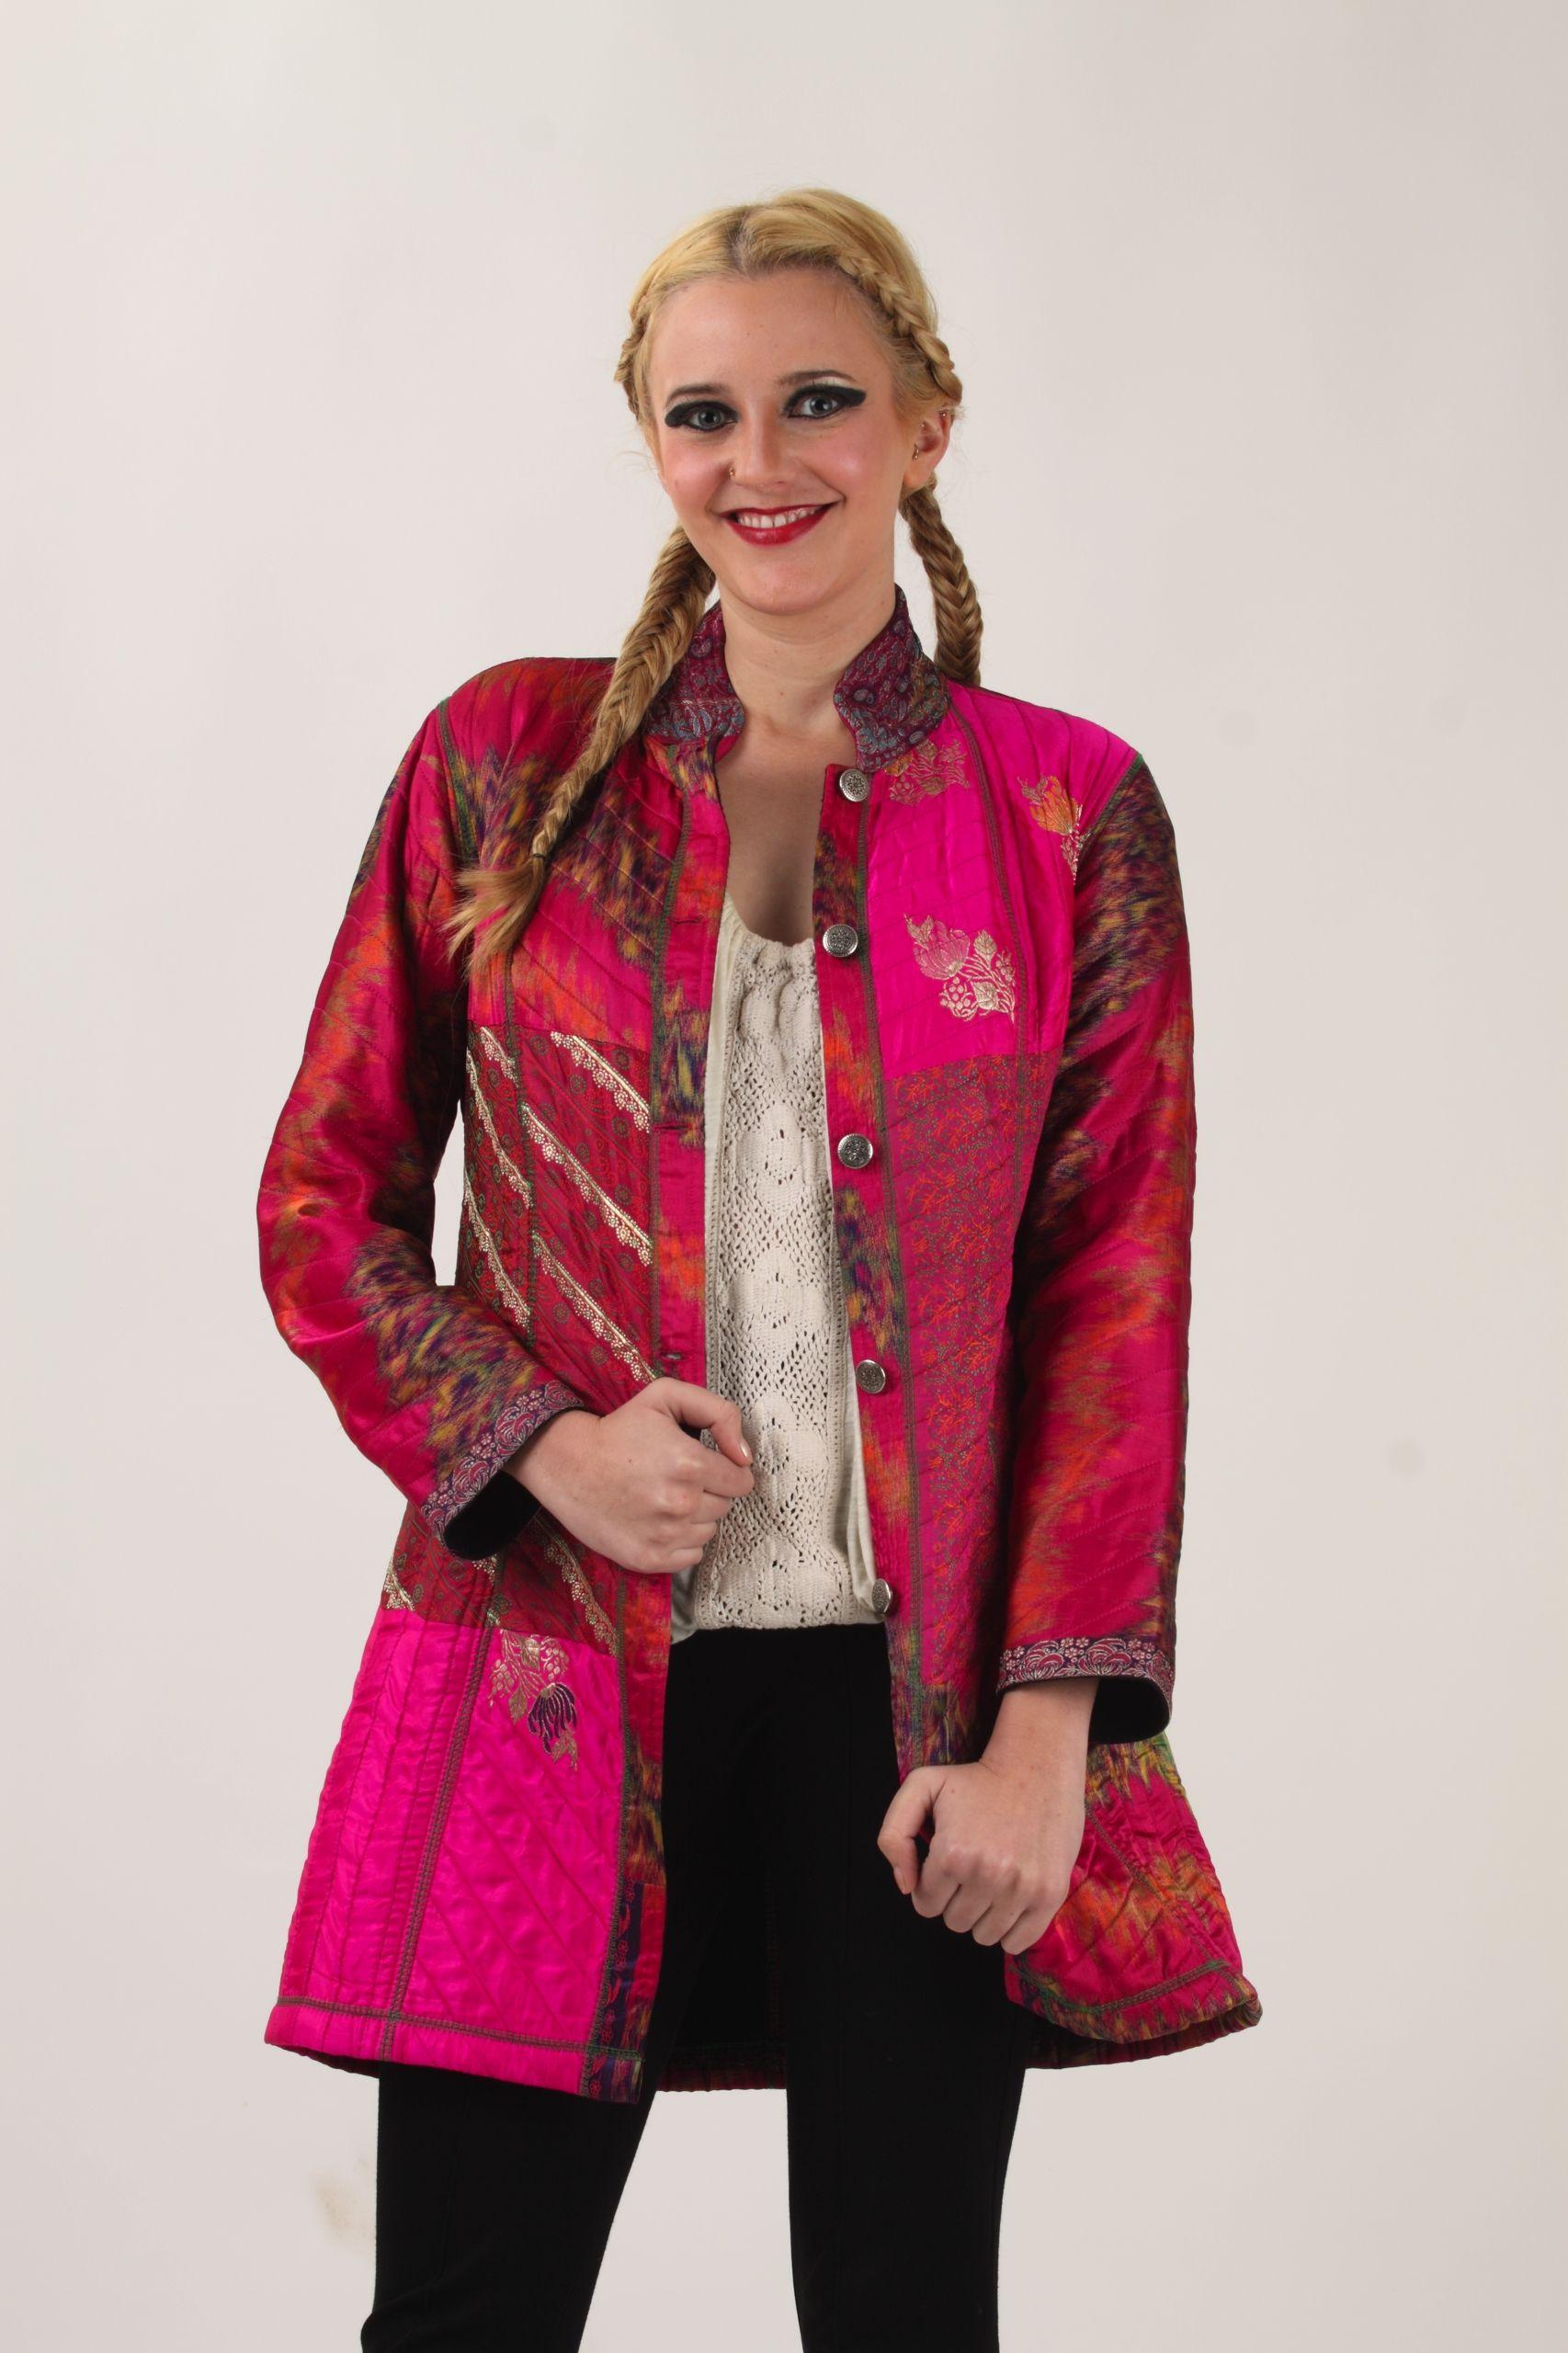 The 5 Button Saree Jacket Hand Made on Earth Saree